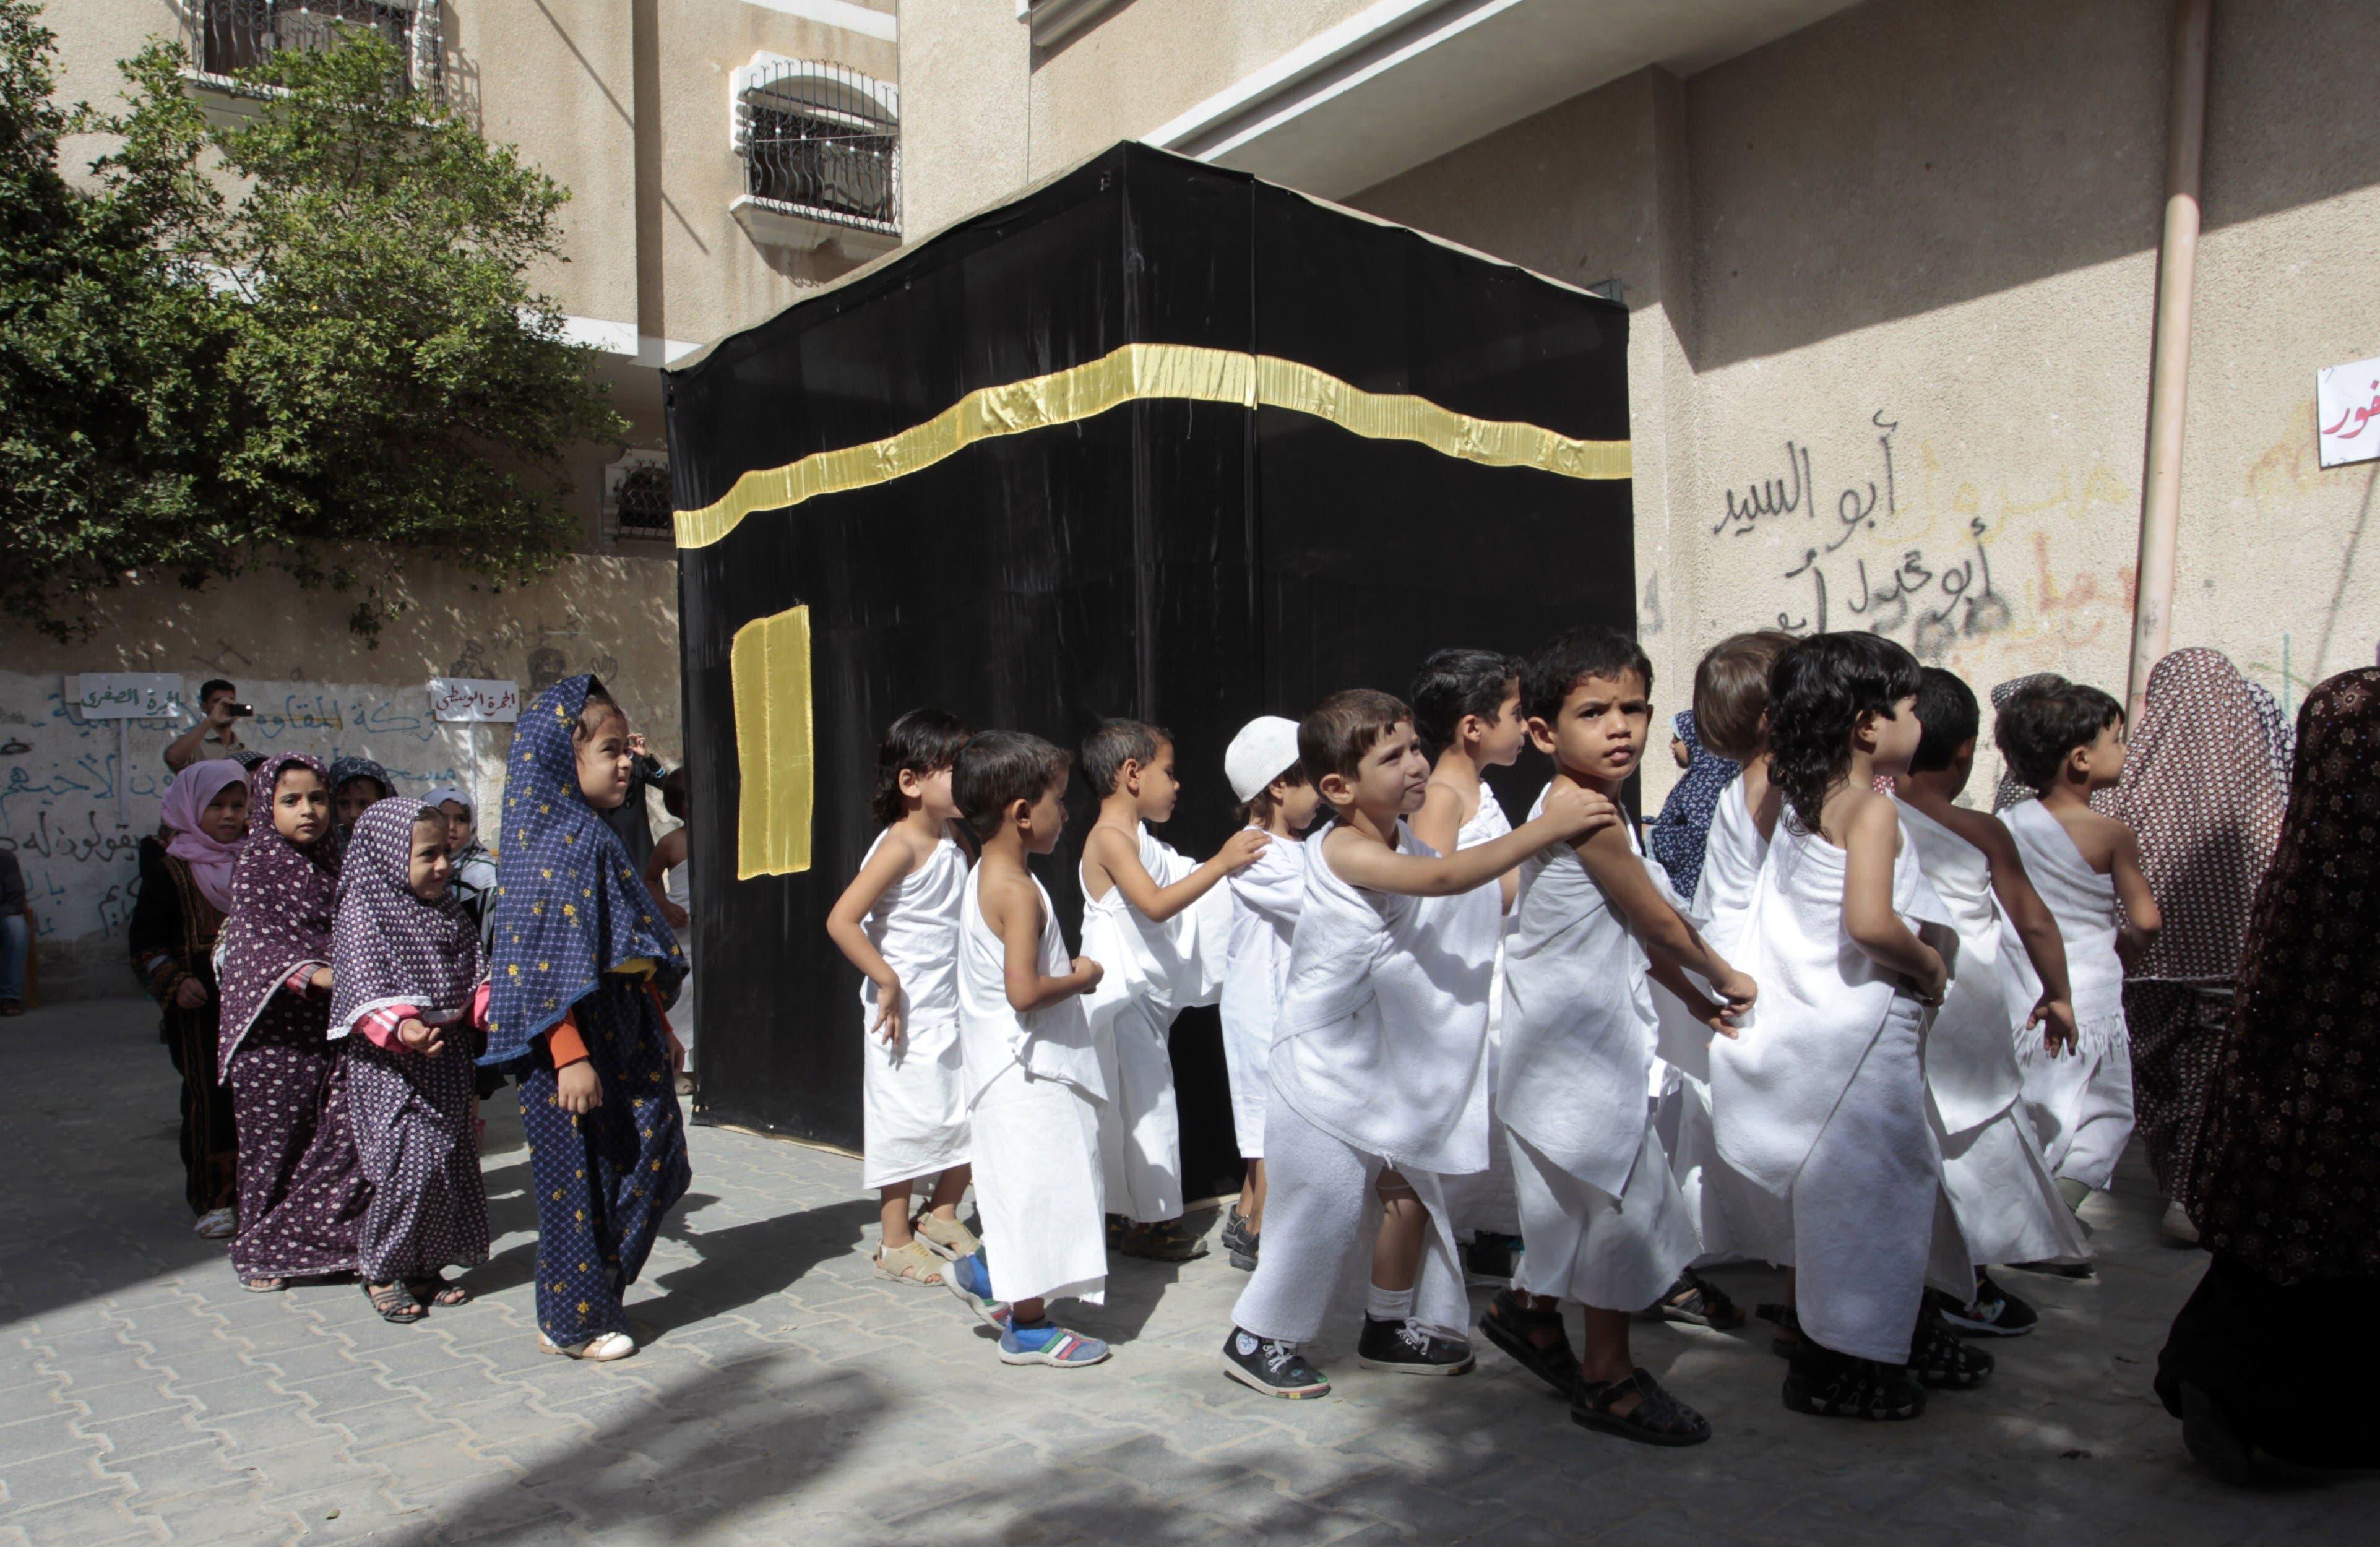 Palestinian children learn about hajj